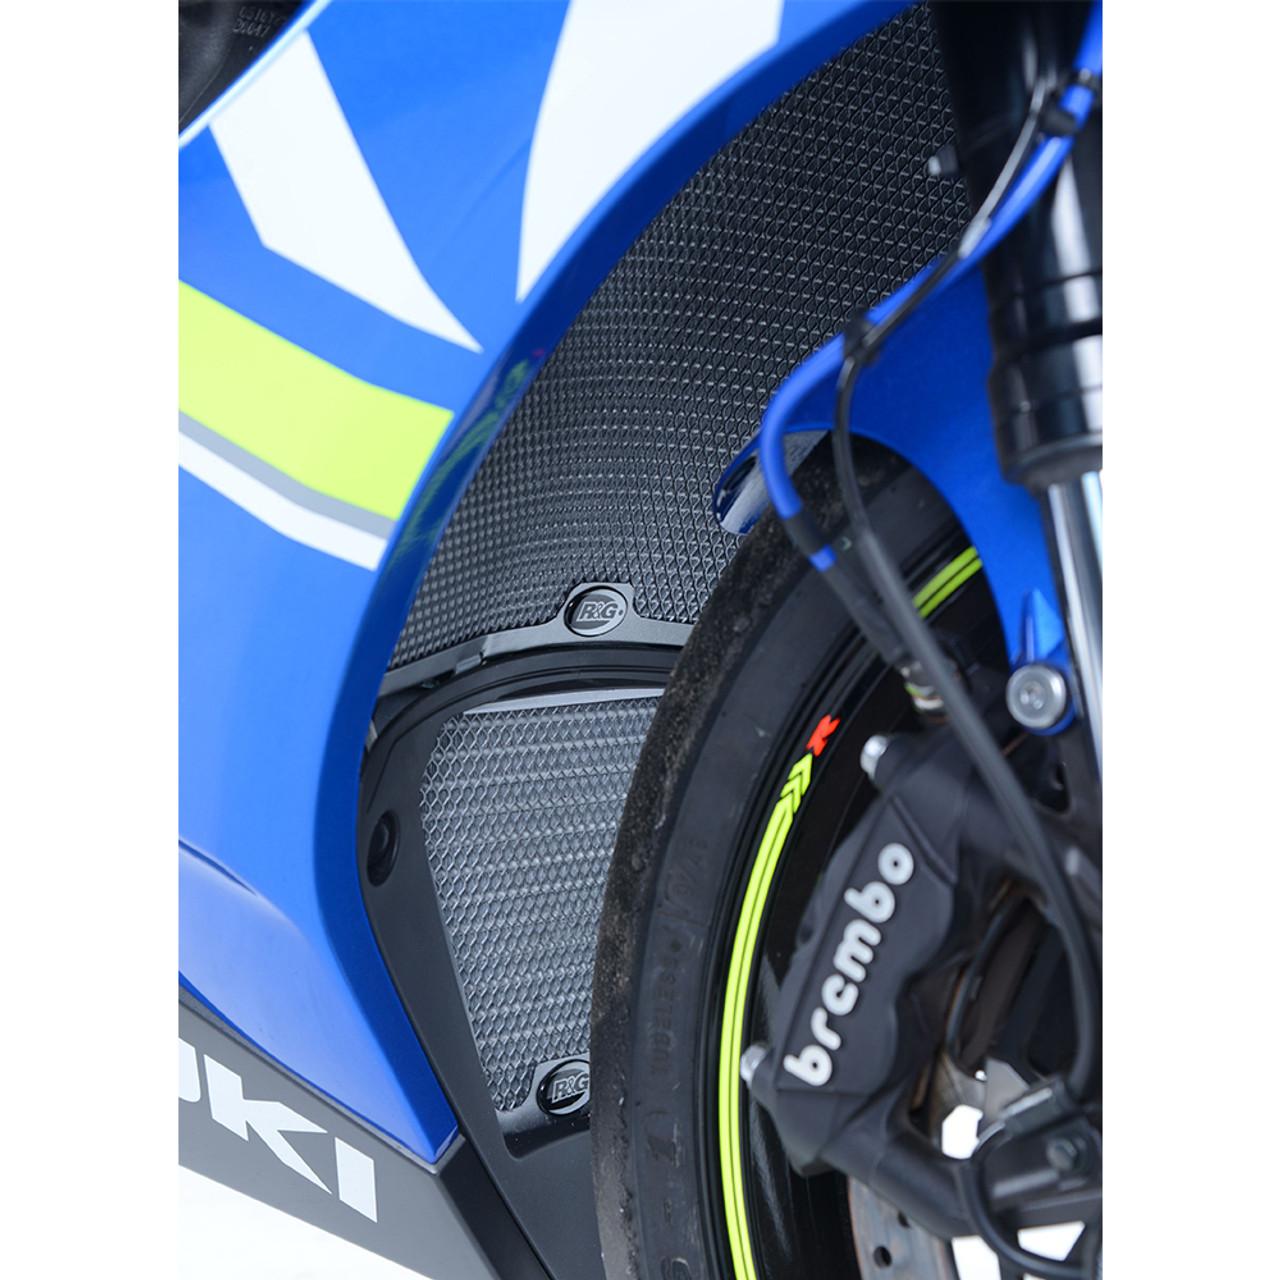 R&G Racing Suzuki GSX-R1000 17-19 Radiator & Oil Cooler Guard